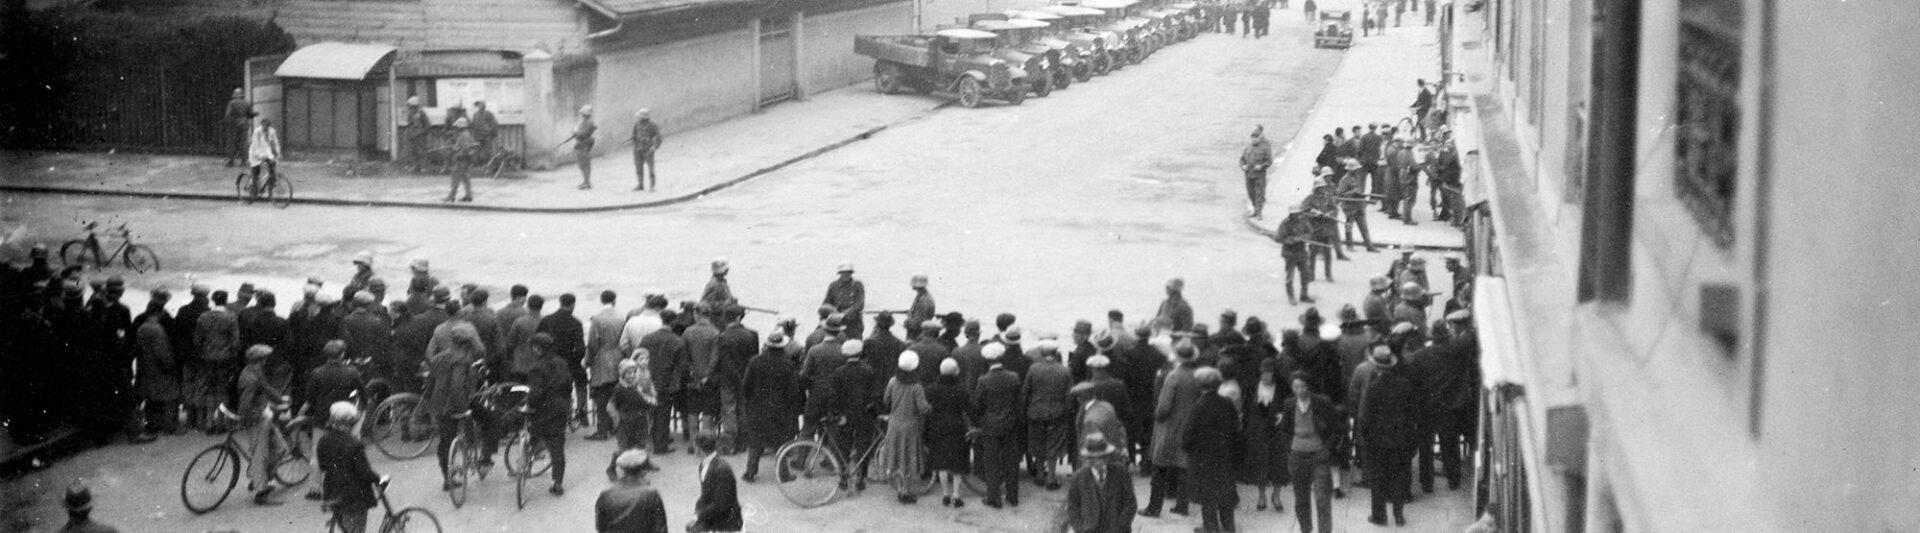 Genève, 9 novembre 1932